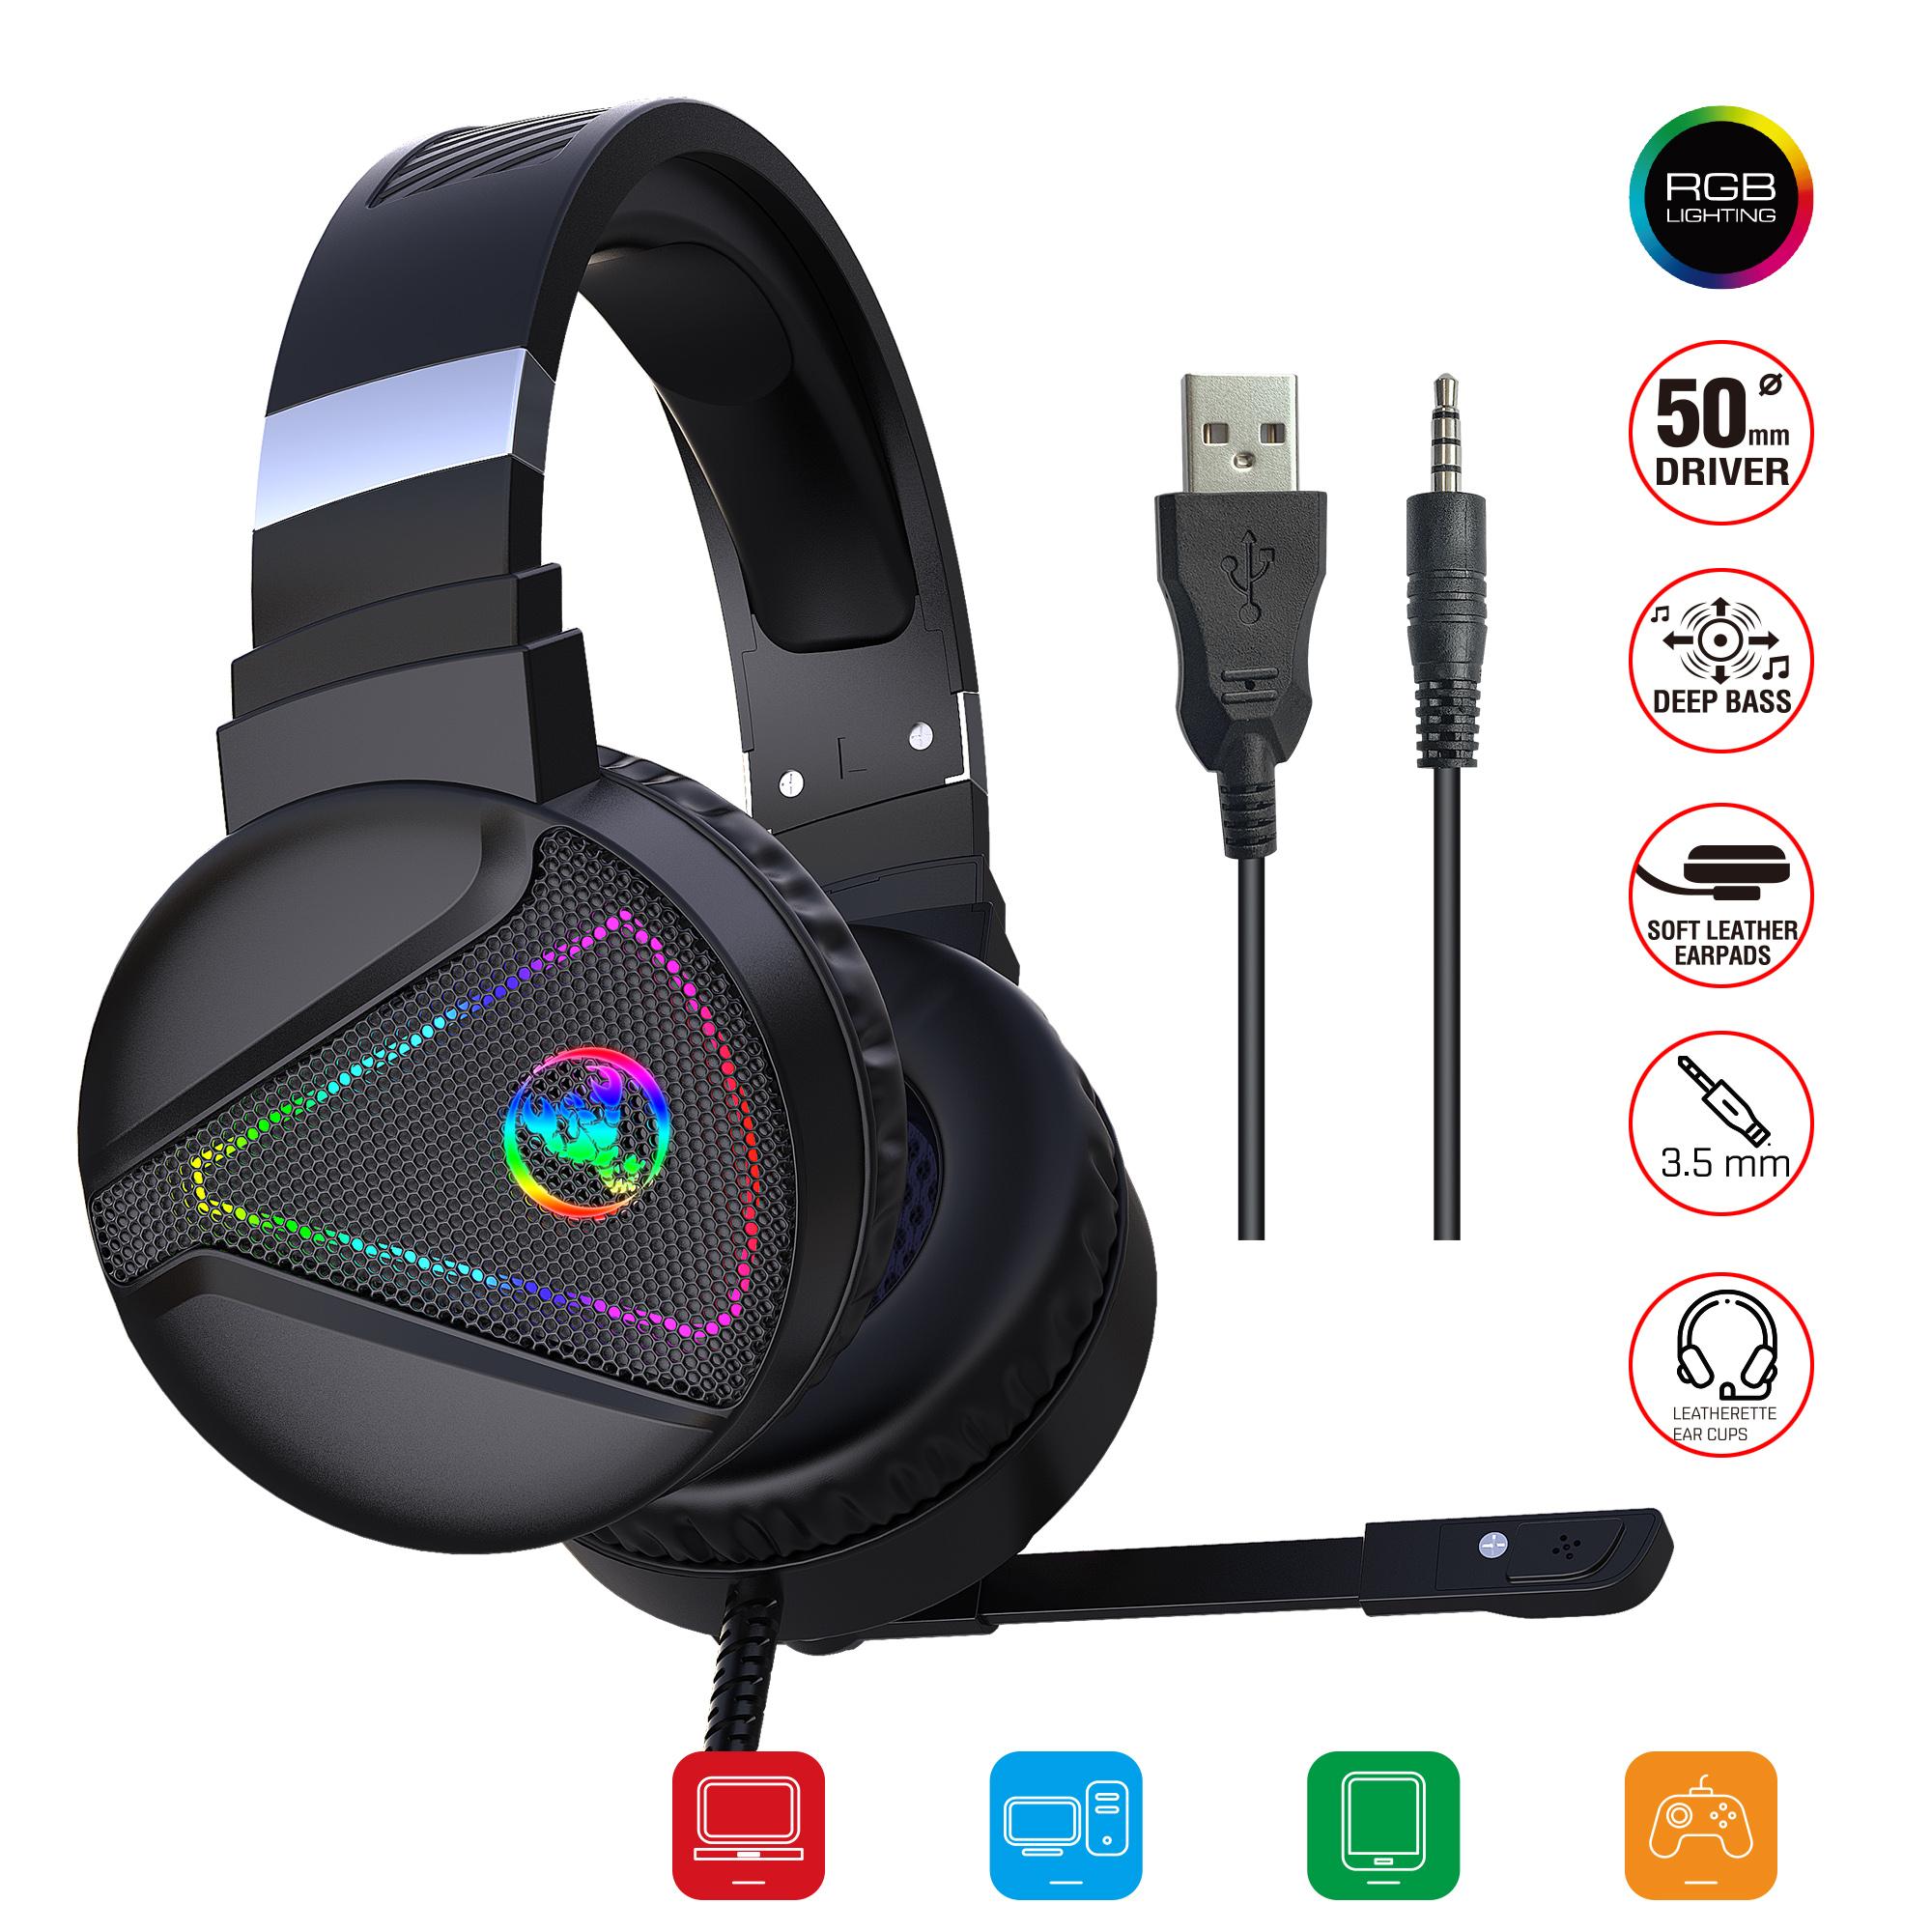 F16 Head-mounted Gaming Headset RGB Luminous Computer Headset Wired Gaming Headset Black